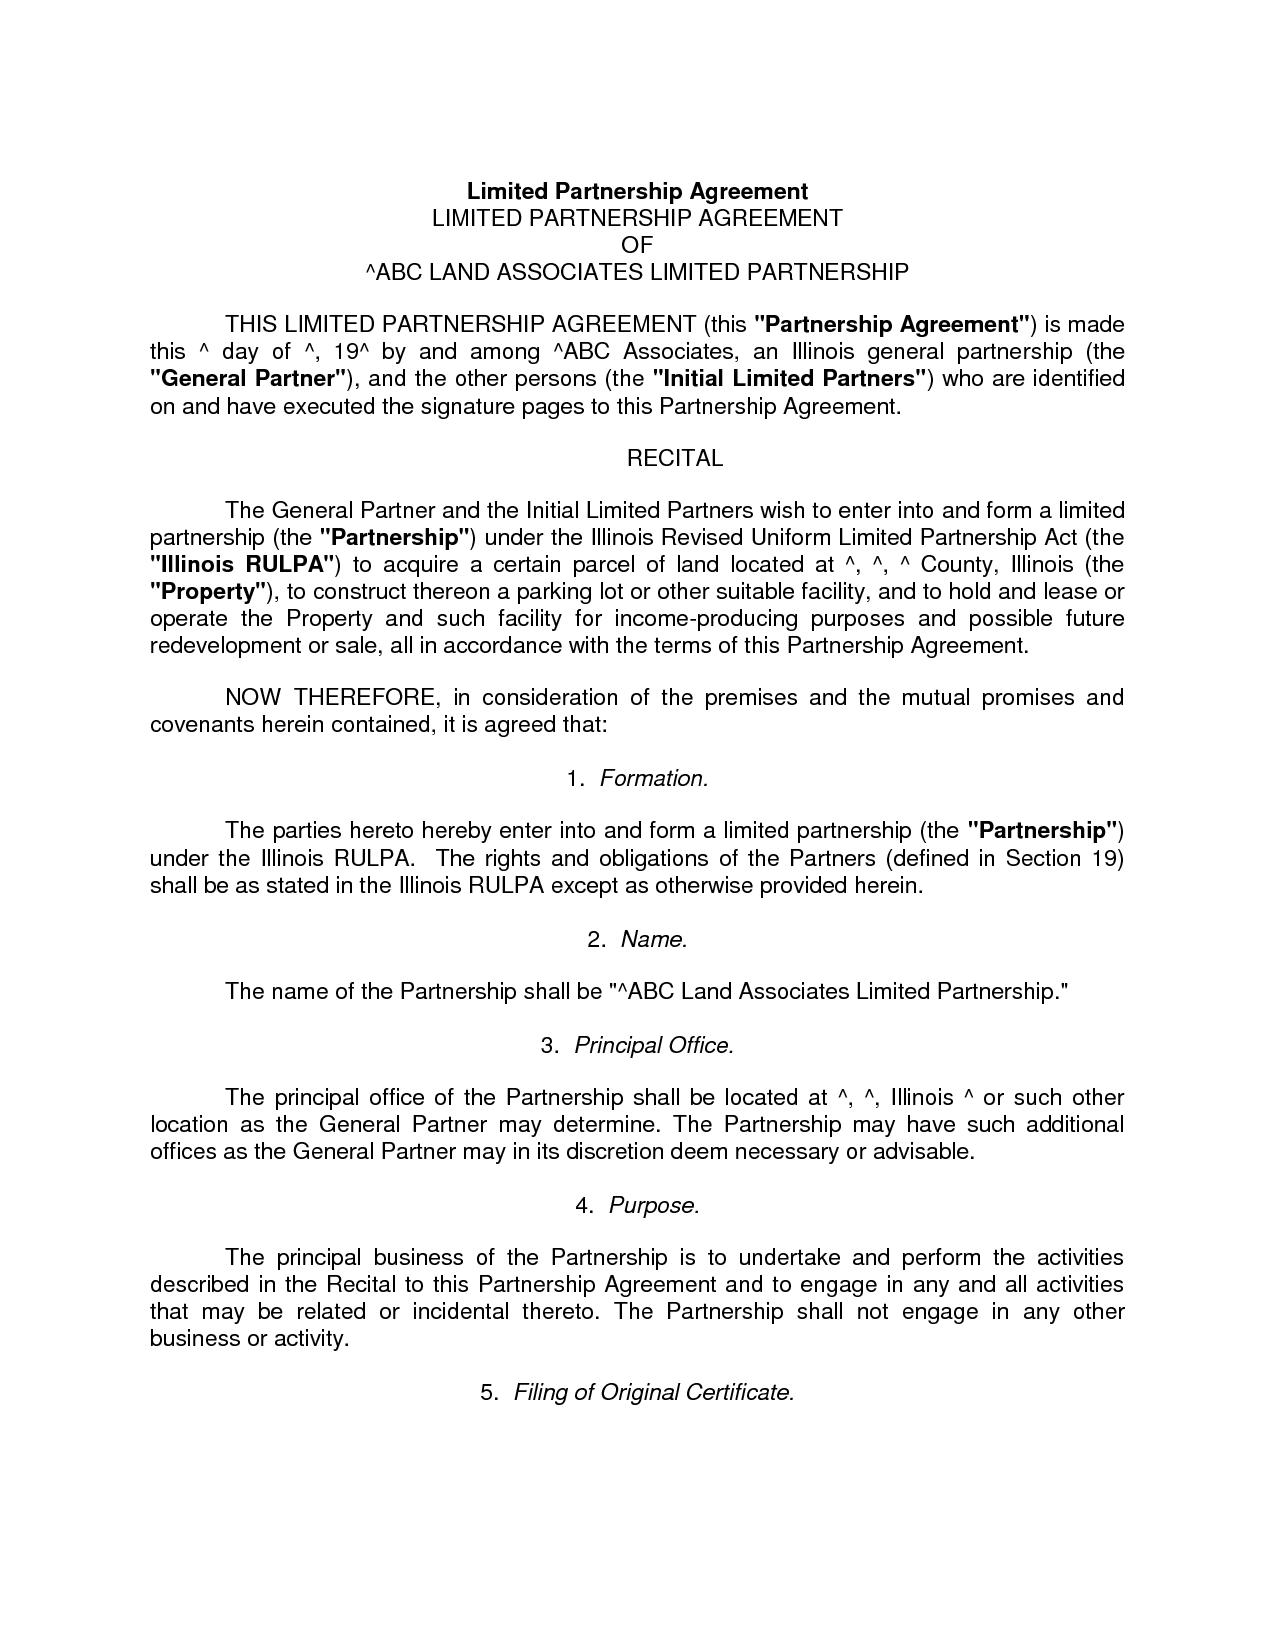 Partnership Dissolution Agreement Template Free